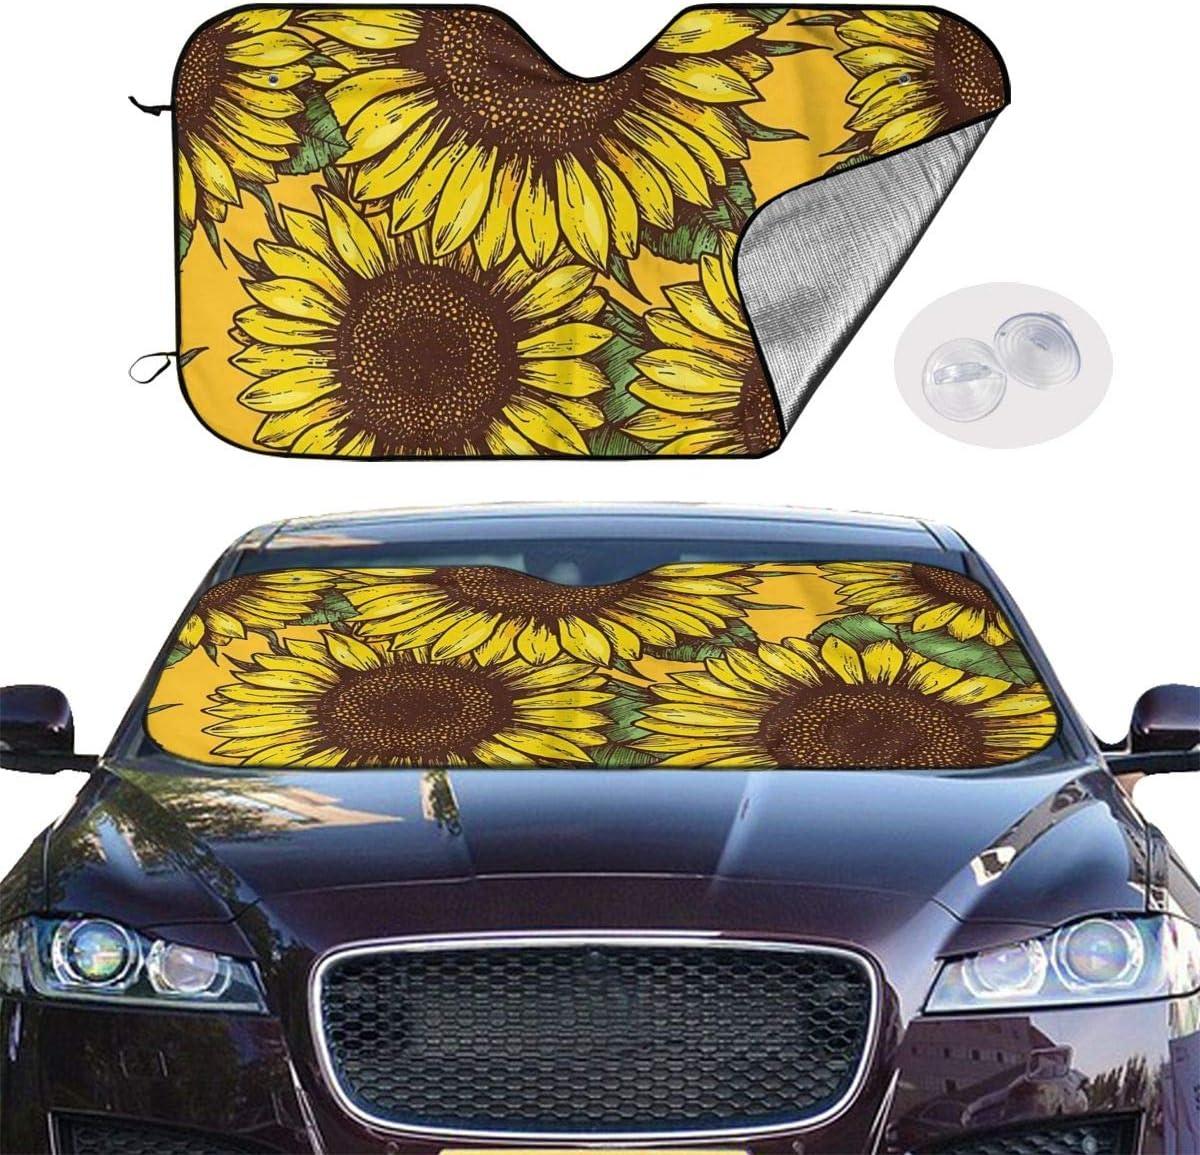 antfeagor Sunflower Light Car Windshield Sun Shade,Front Auto Car Windshield Sun Shade,Keep Vehicle Cool Protect Your Car from Sun Heat//Blocks Uv Rays